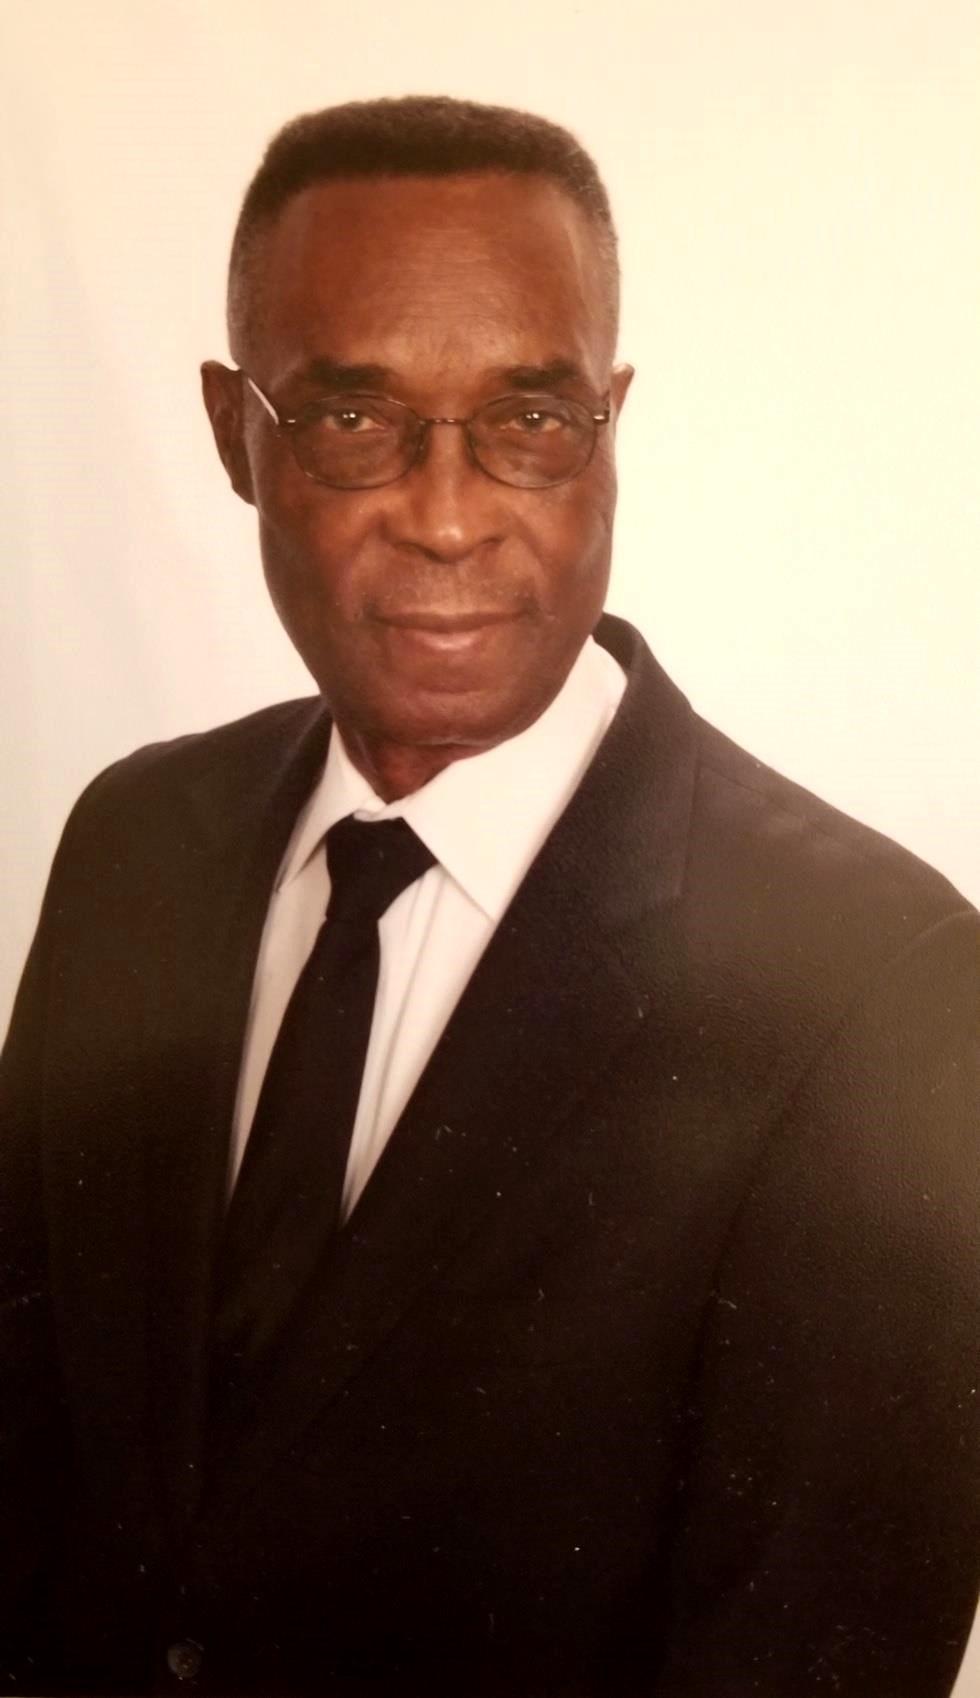 Joe Louis  Jackson